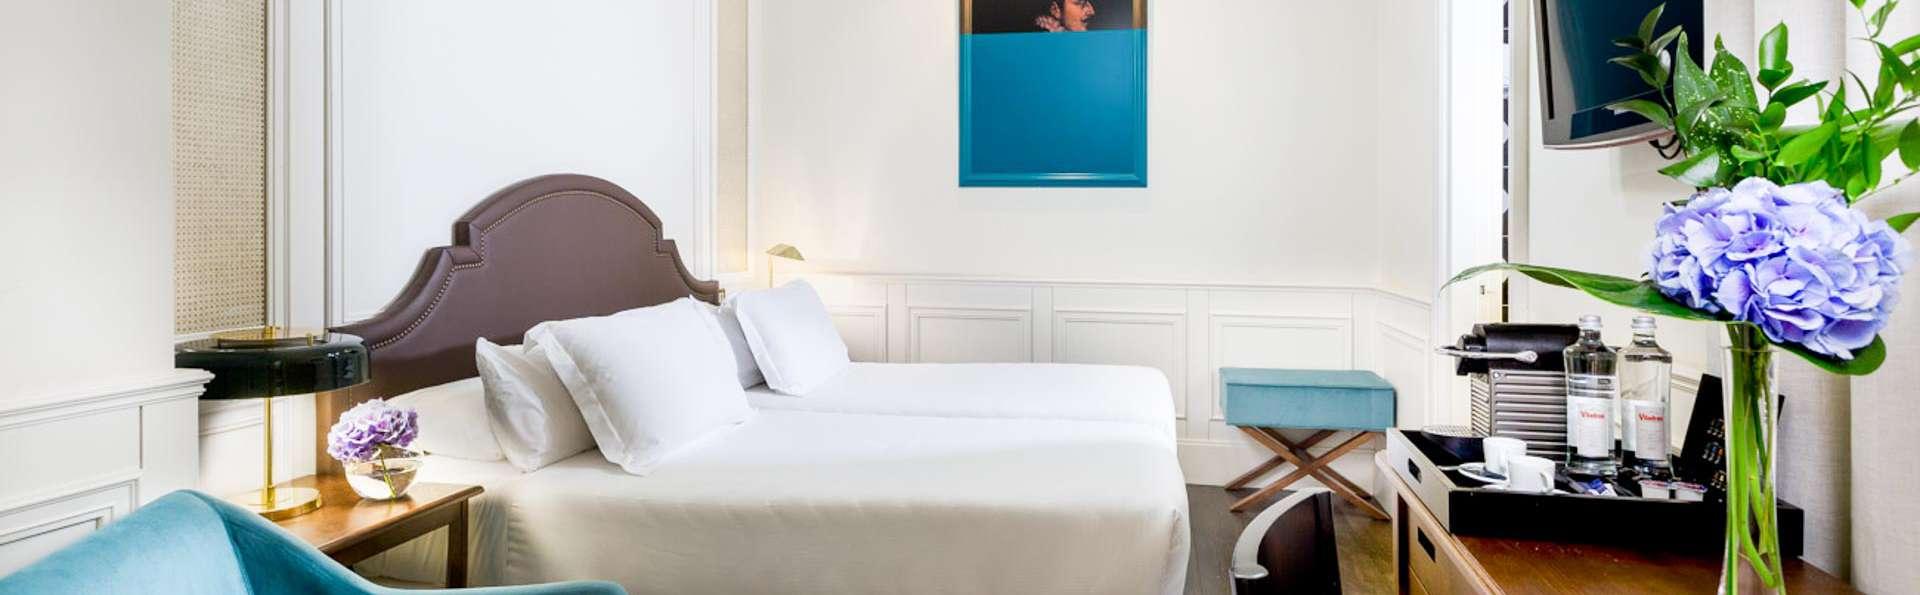 Escapade romantique avec fruits et chocolat dans la chambre d'un hôtel sur la Gran Vía de Madrid